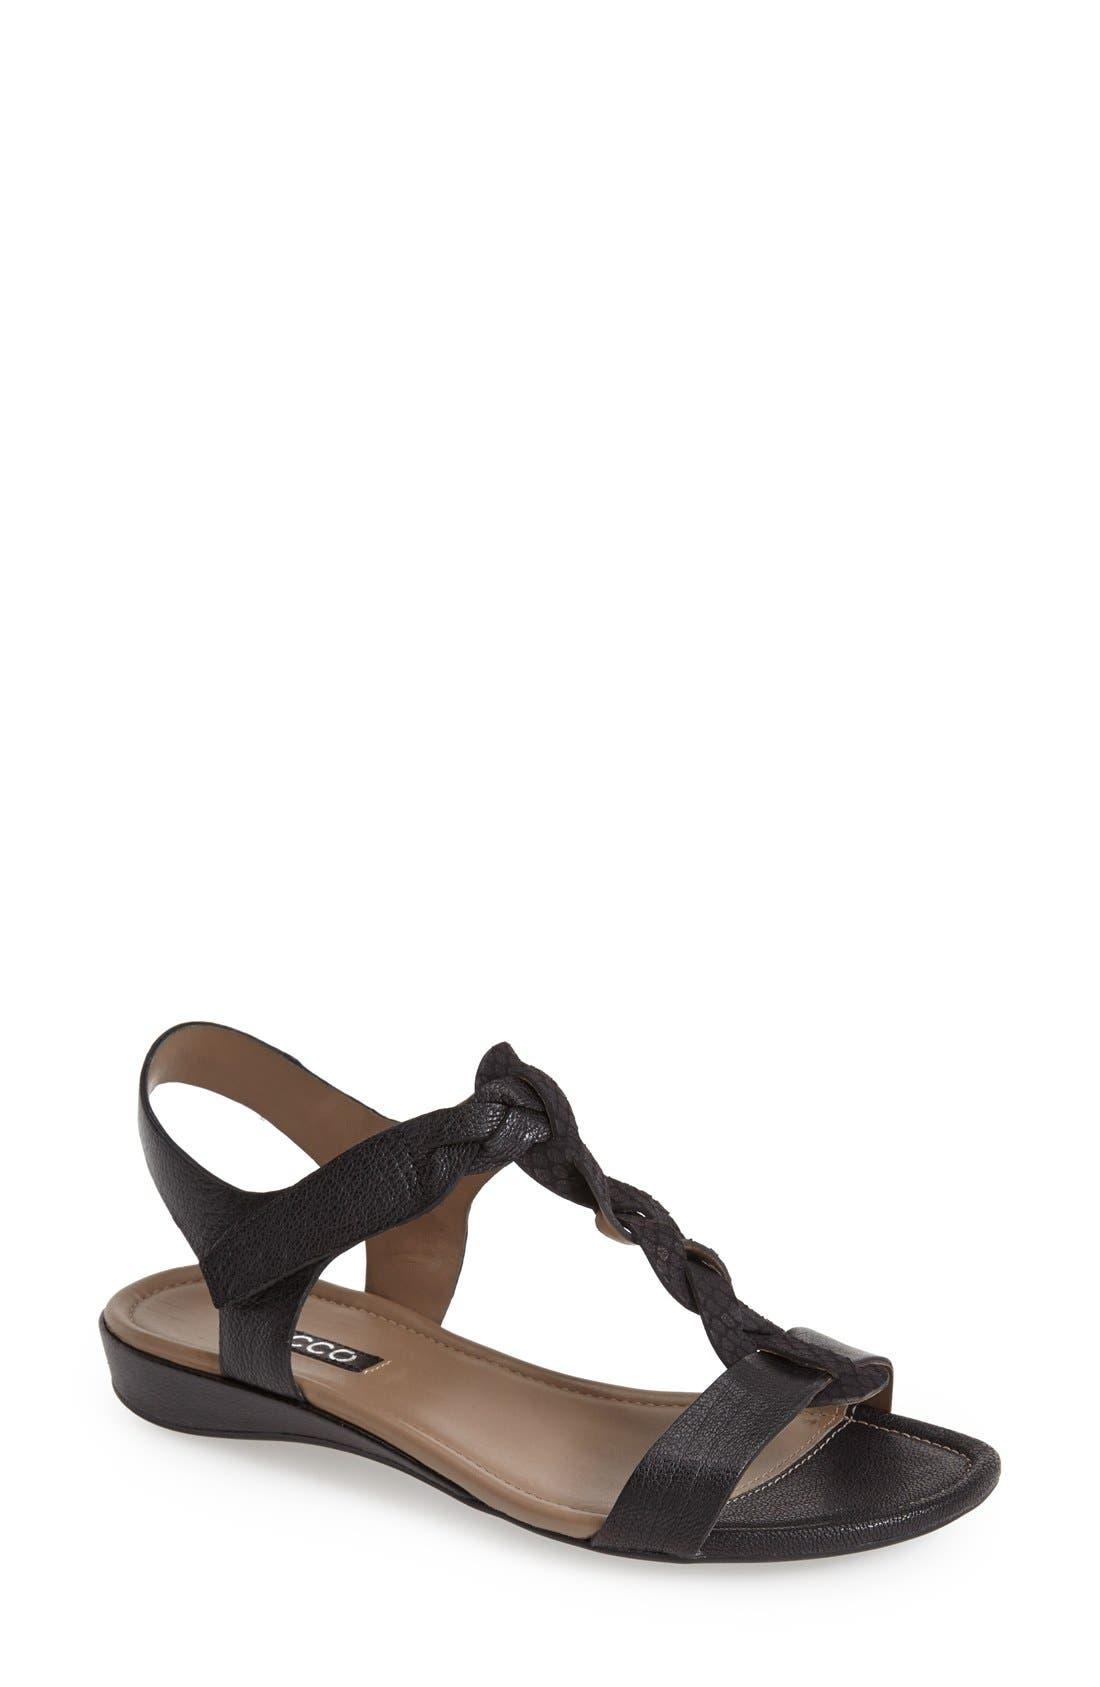 ECCO 'Bouillon' Leather Sandal, Main, color, 001